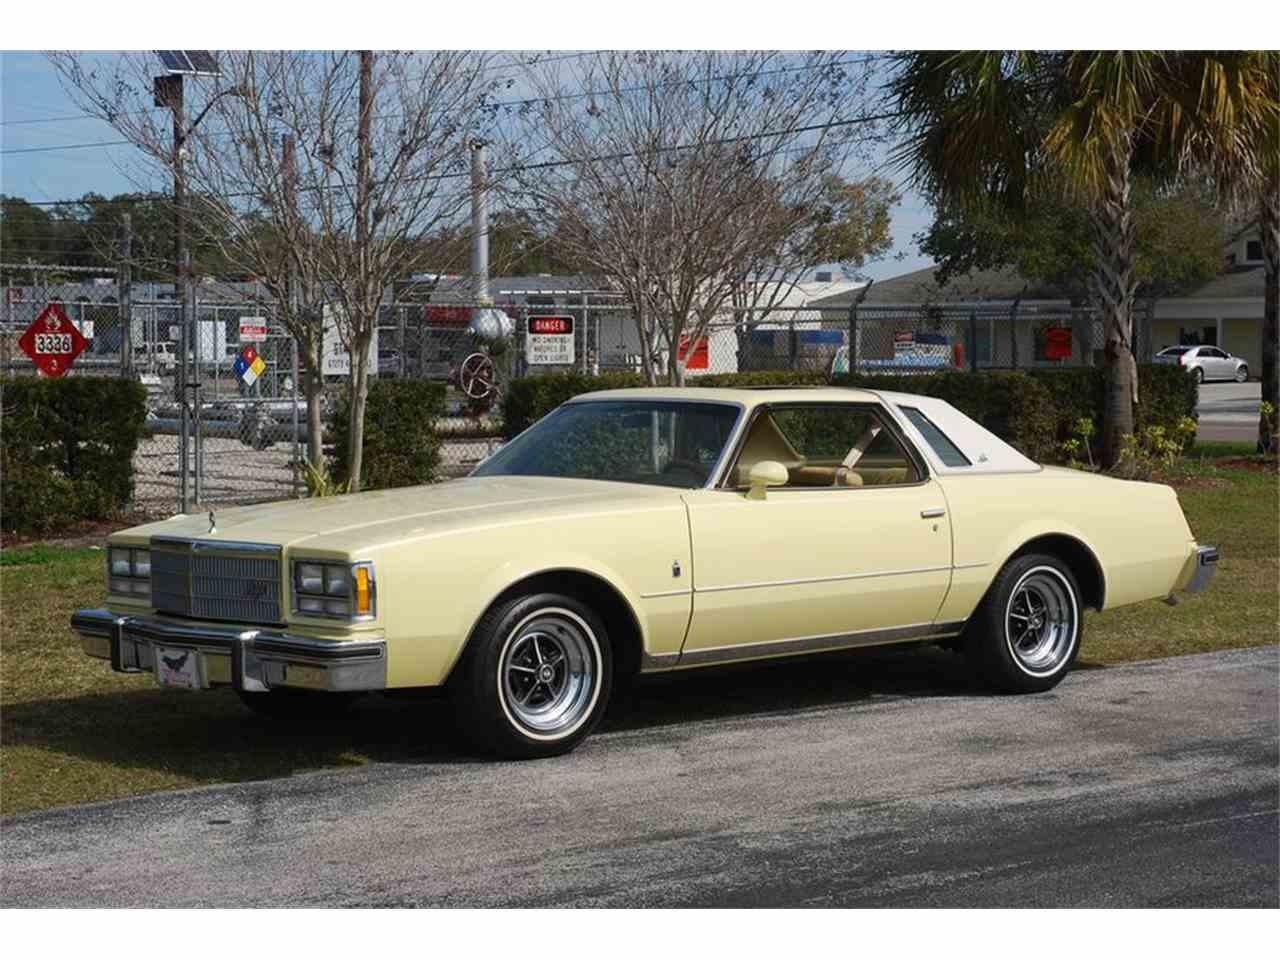 regal sale orlando buick vehicles classic landau hd cars for